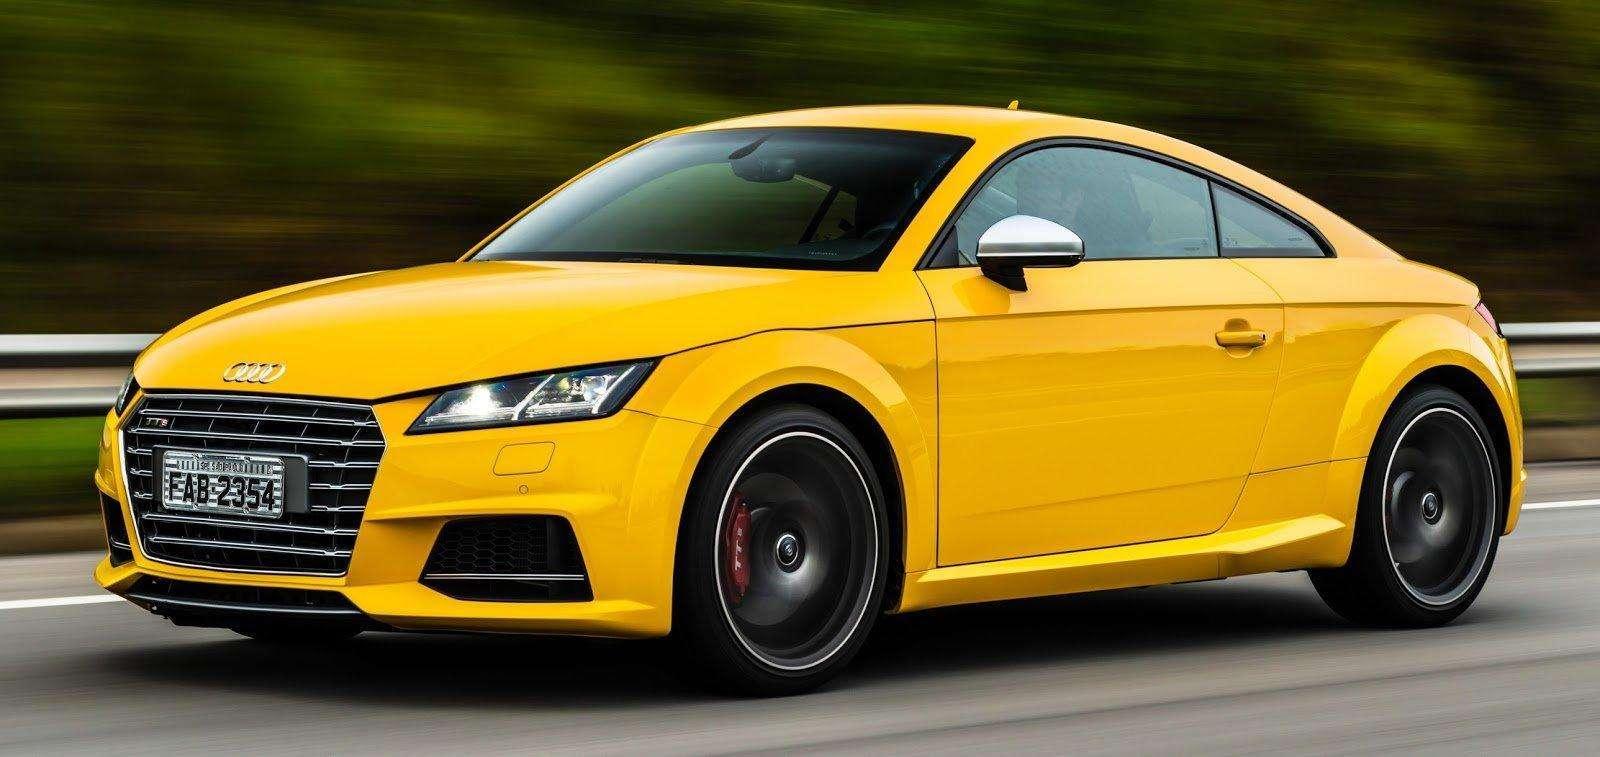 Audi TTS aterriza no Brasil com seus 286 cavalos